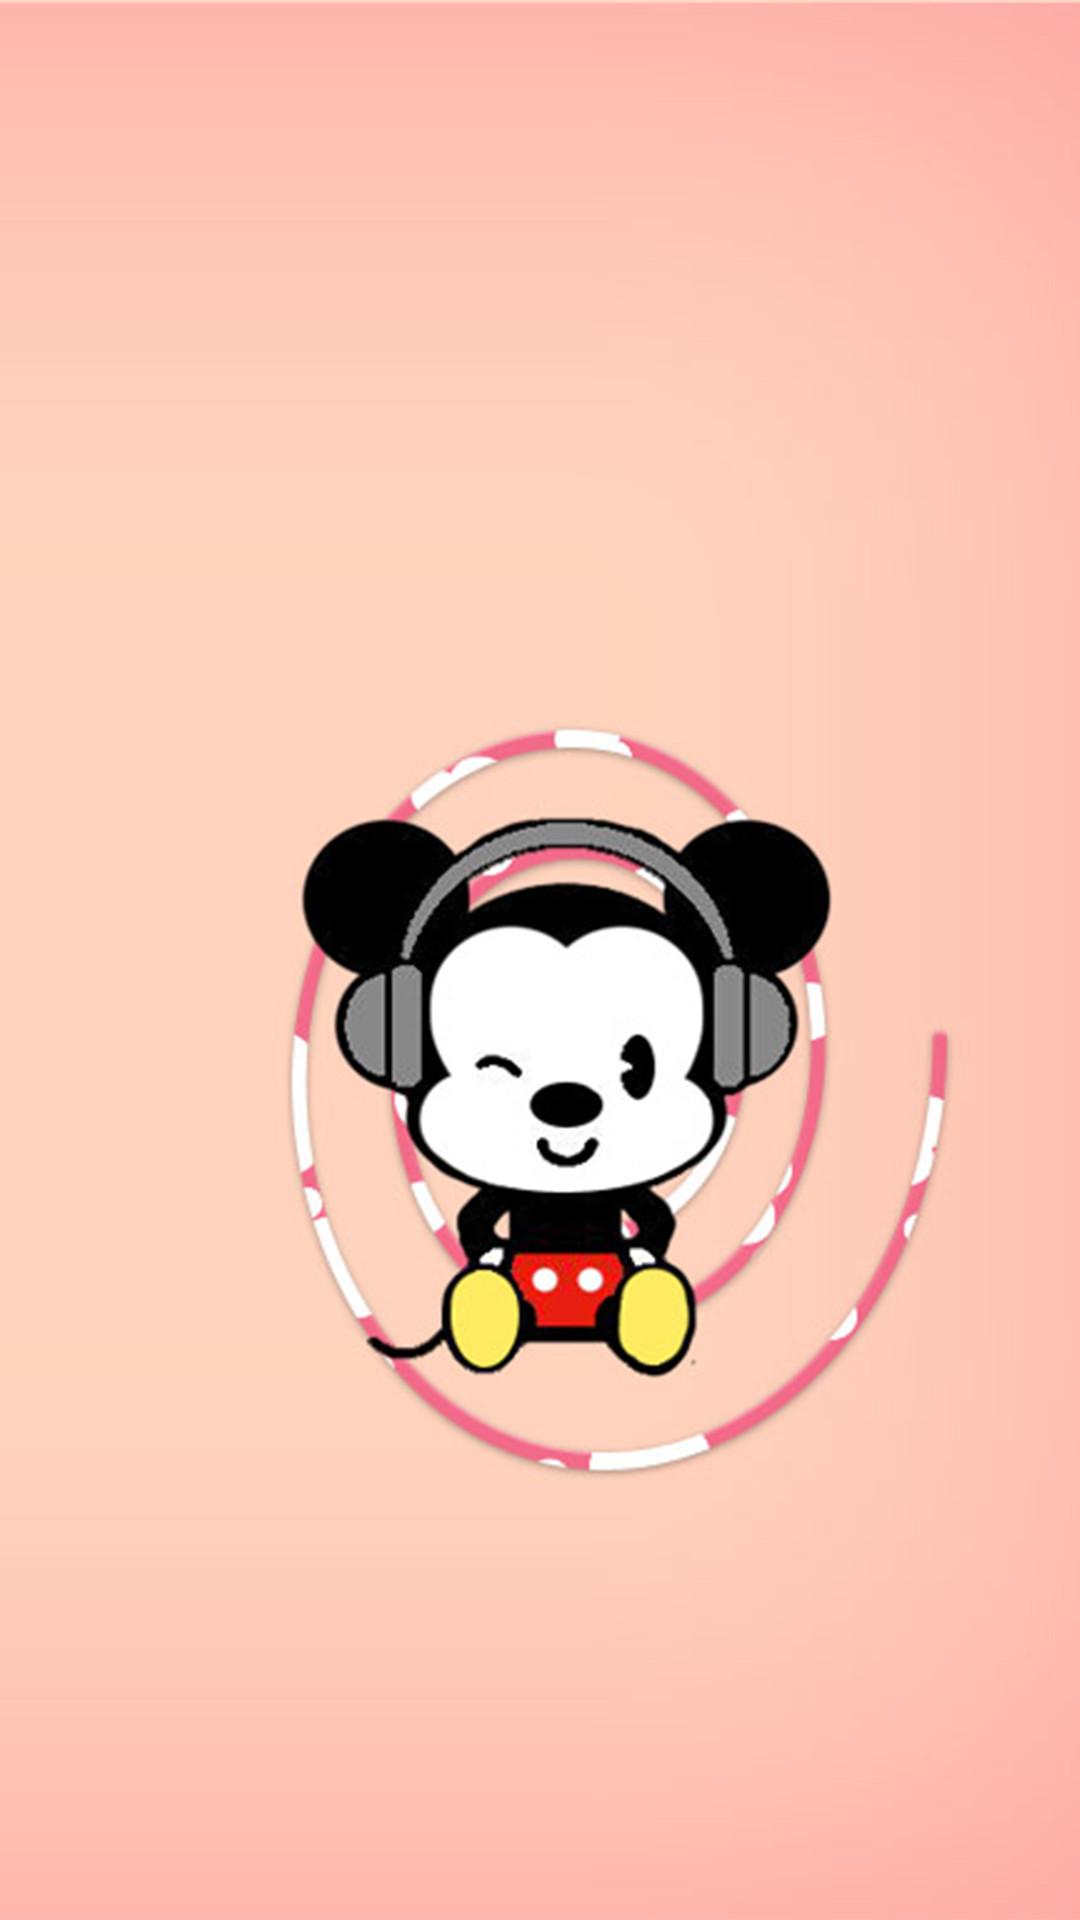 Fall Out Boy Iphone 6 Plus Wallpaper Sfondi Iphone Disney 85 Immagini